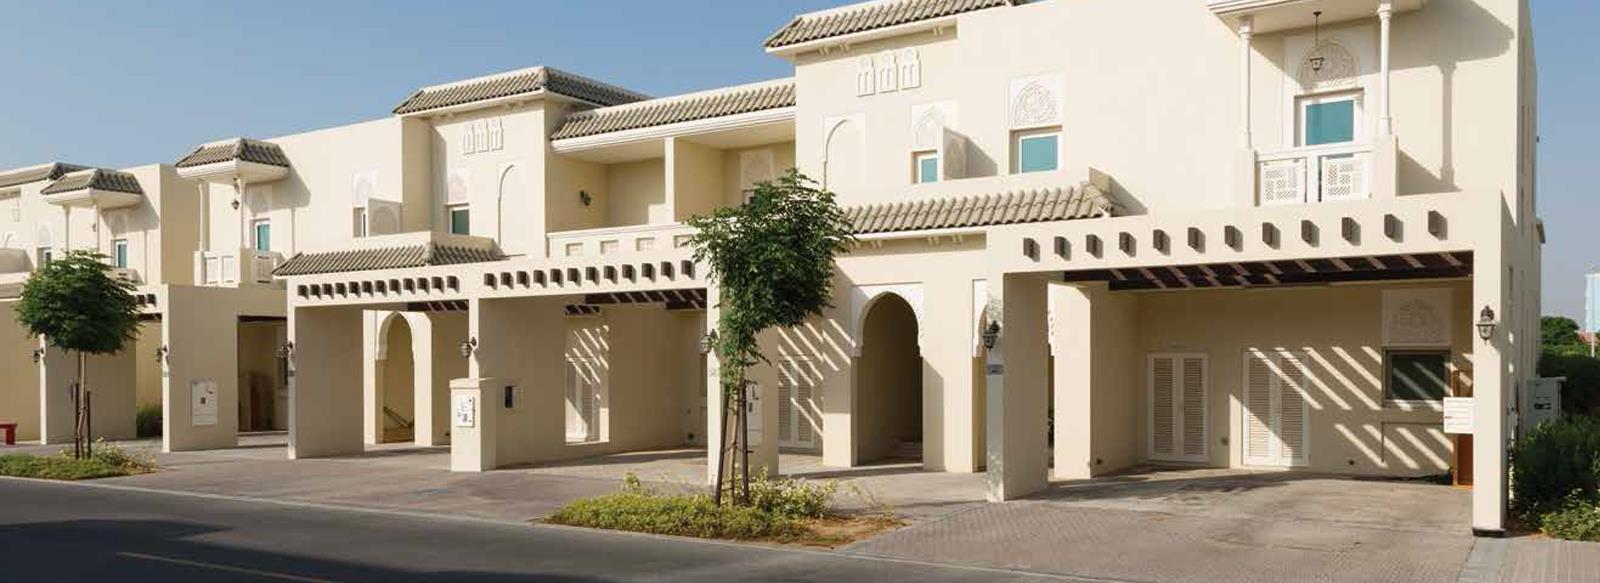 Al Furjan Villas & Townhouses